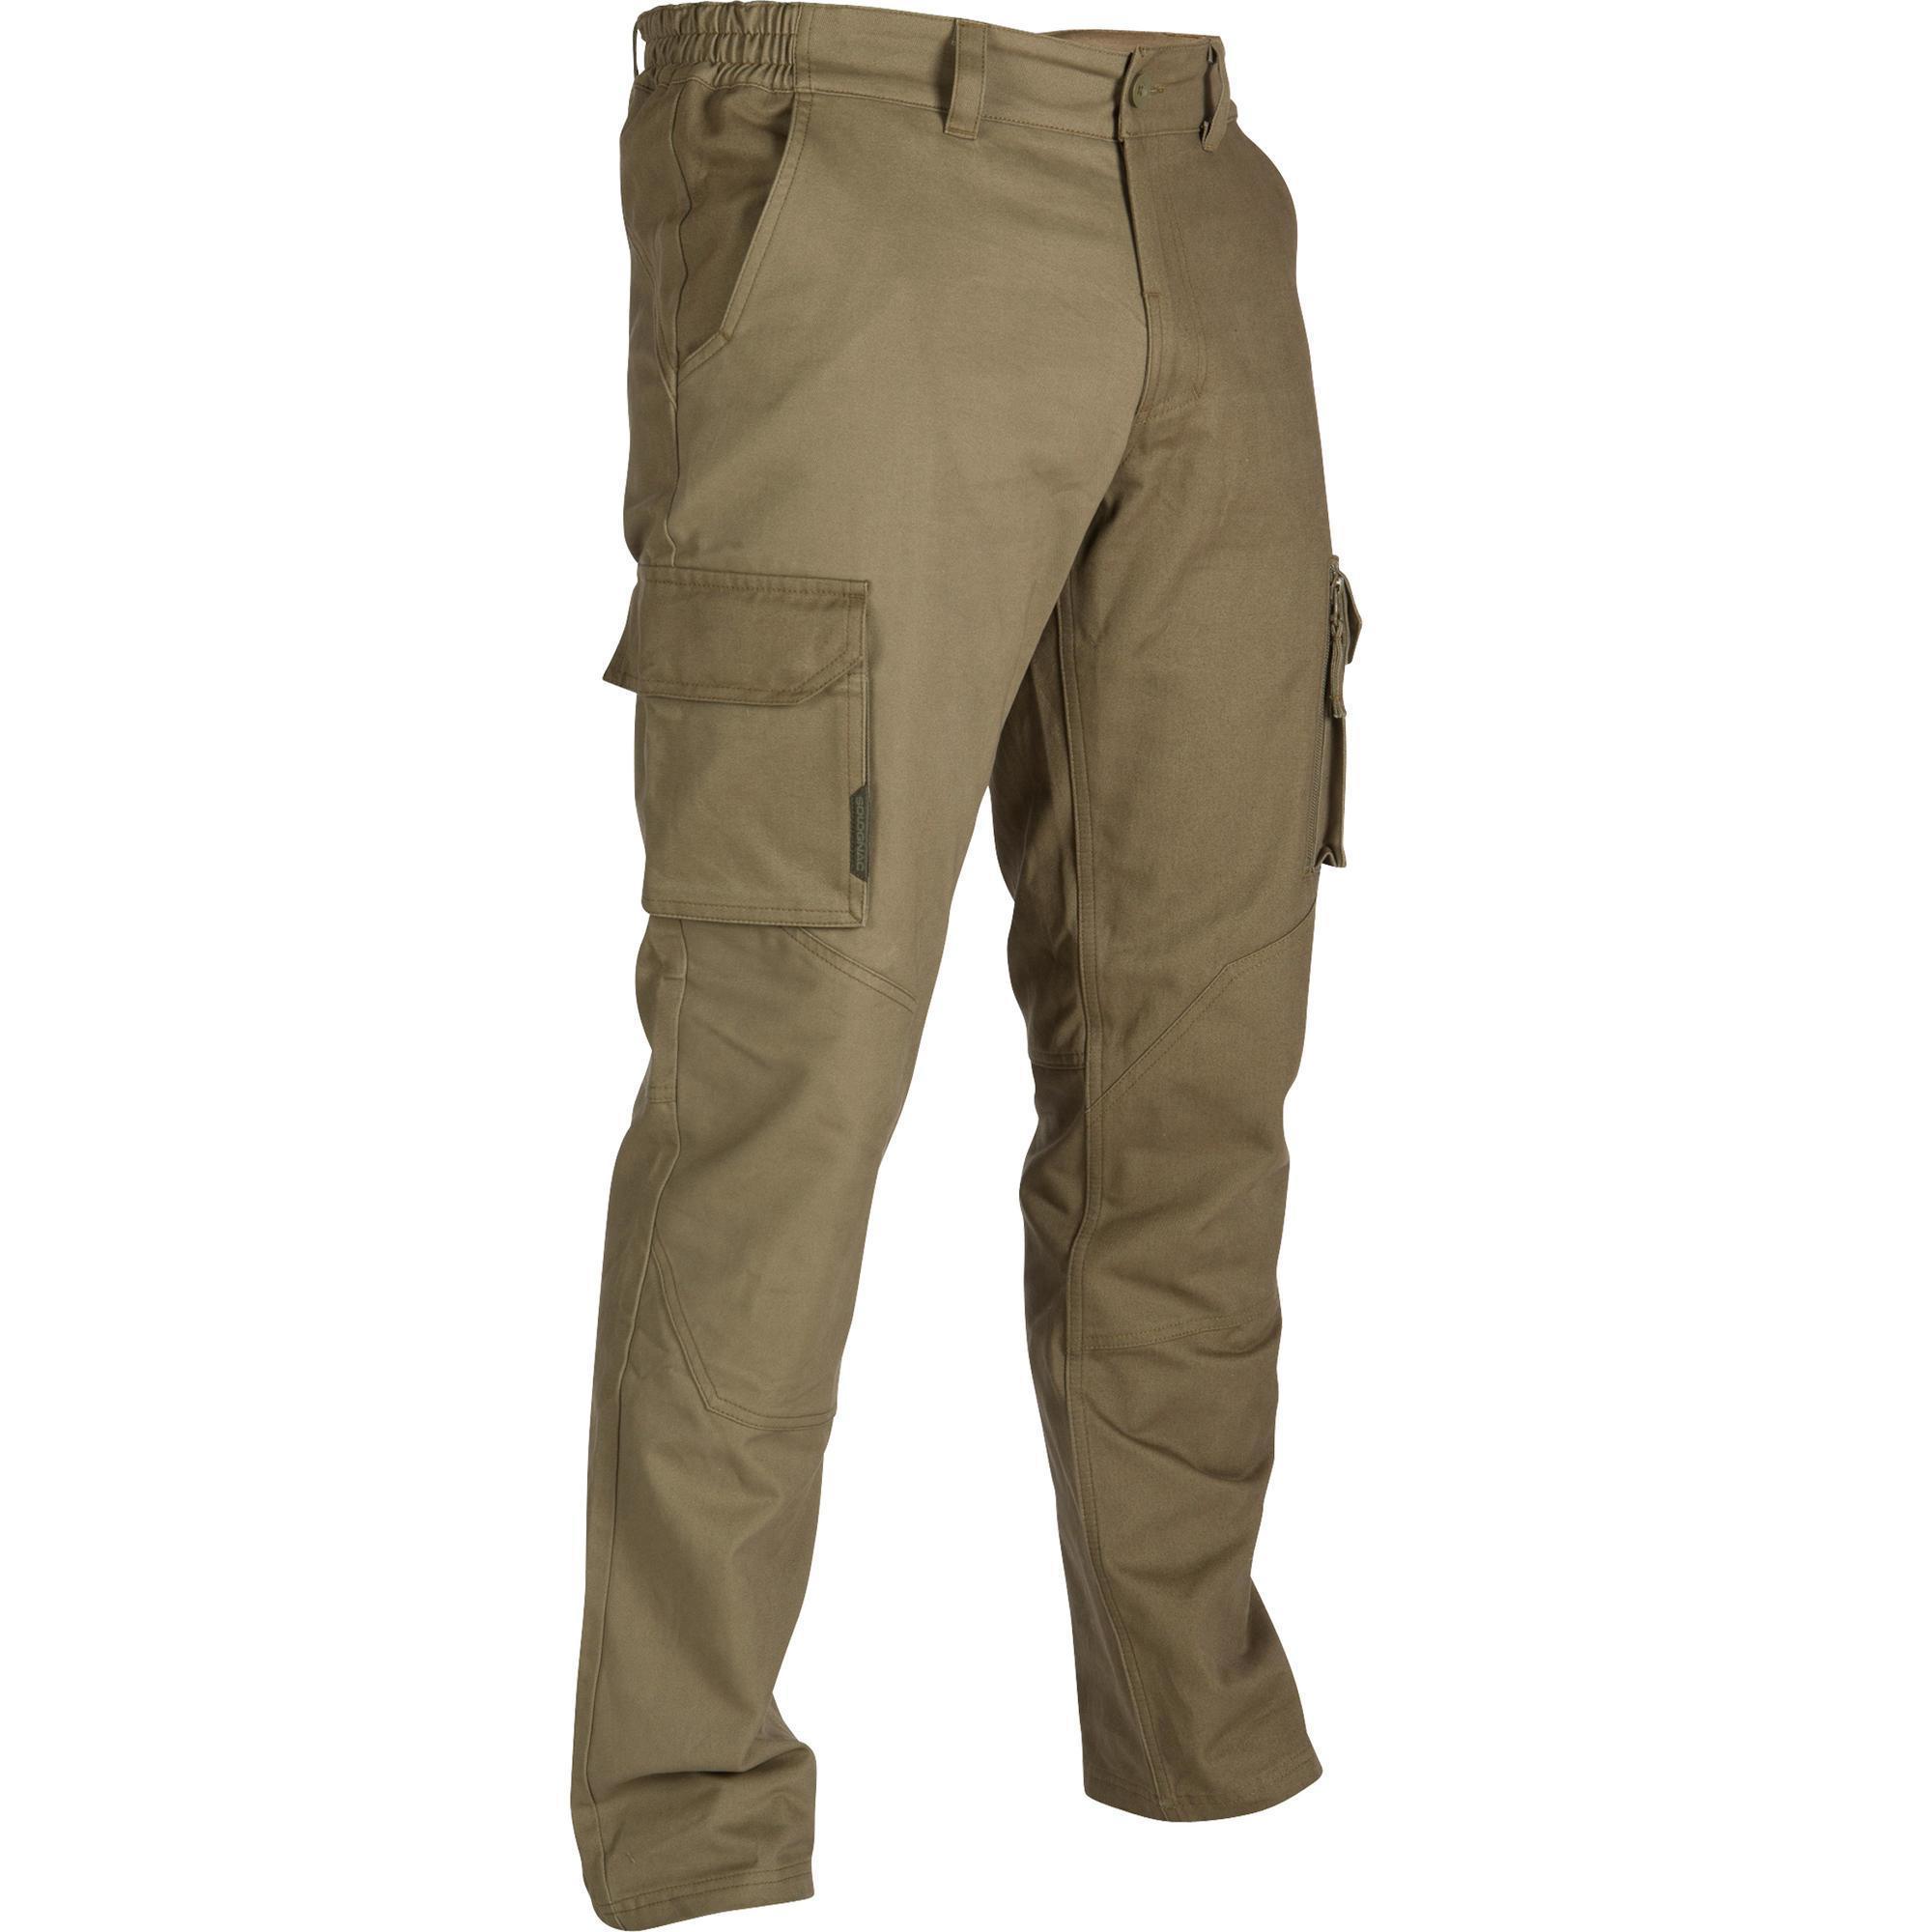 Jagdhose 520 grün   Sportbekleidung > Sporthosen > Trekkinghosen   Solognac